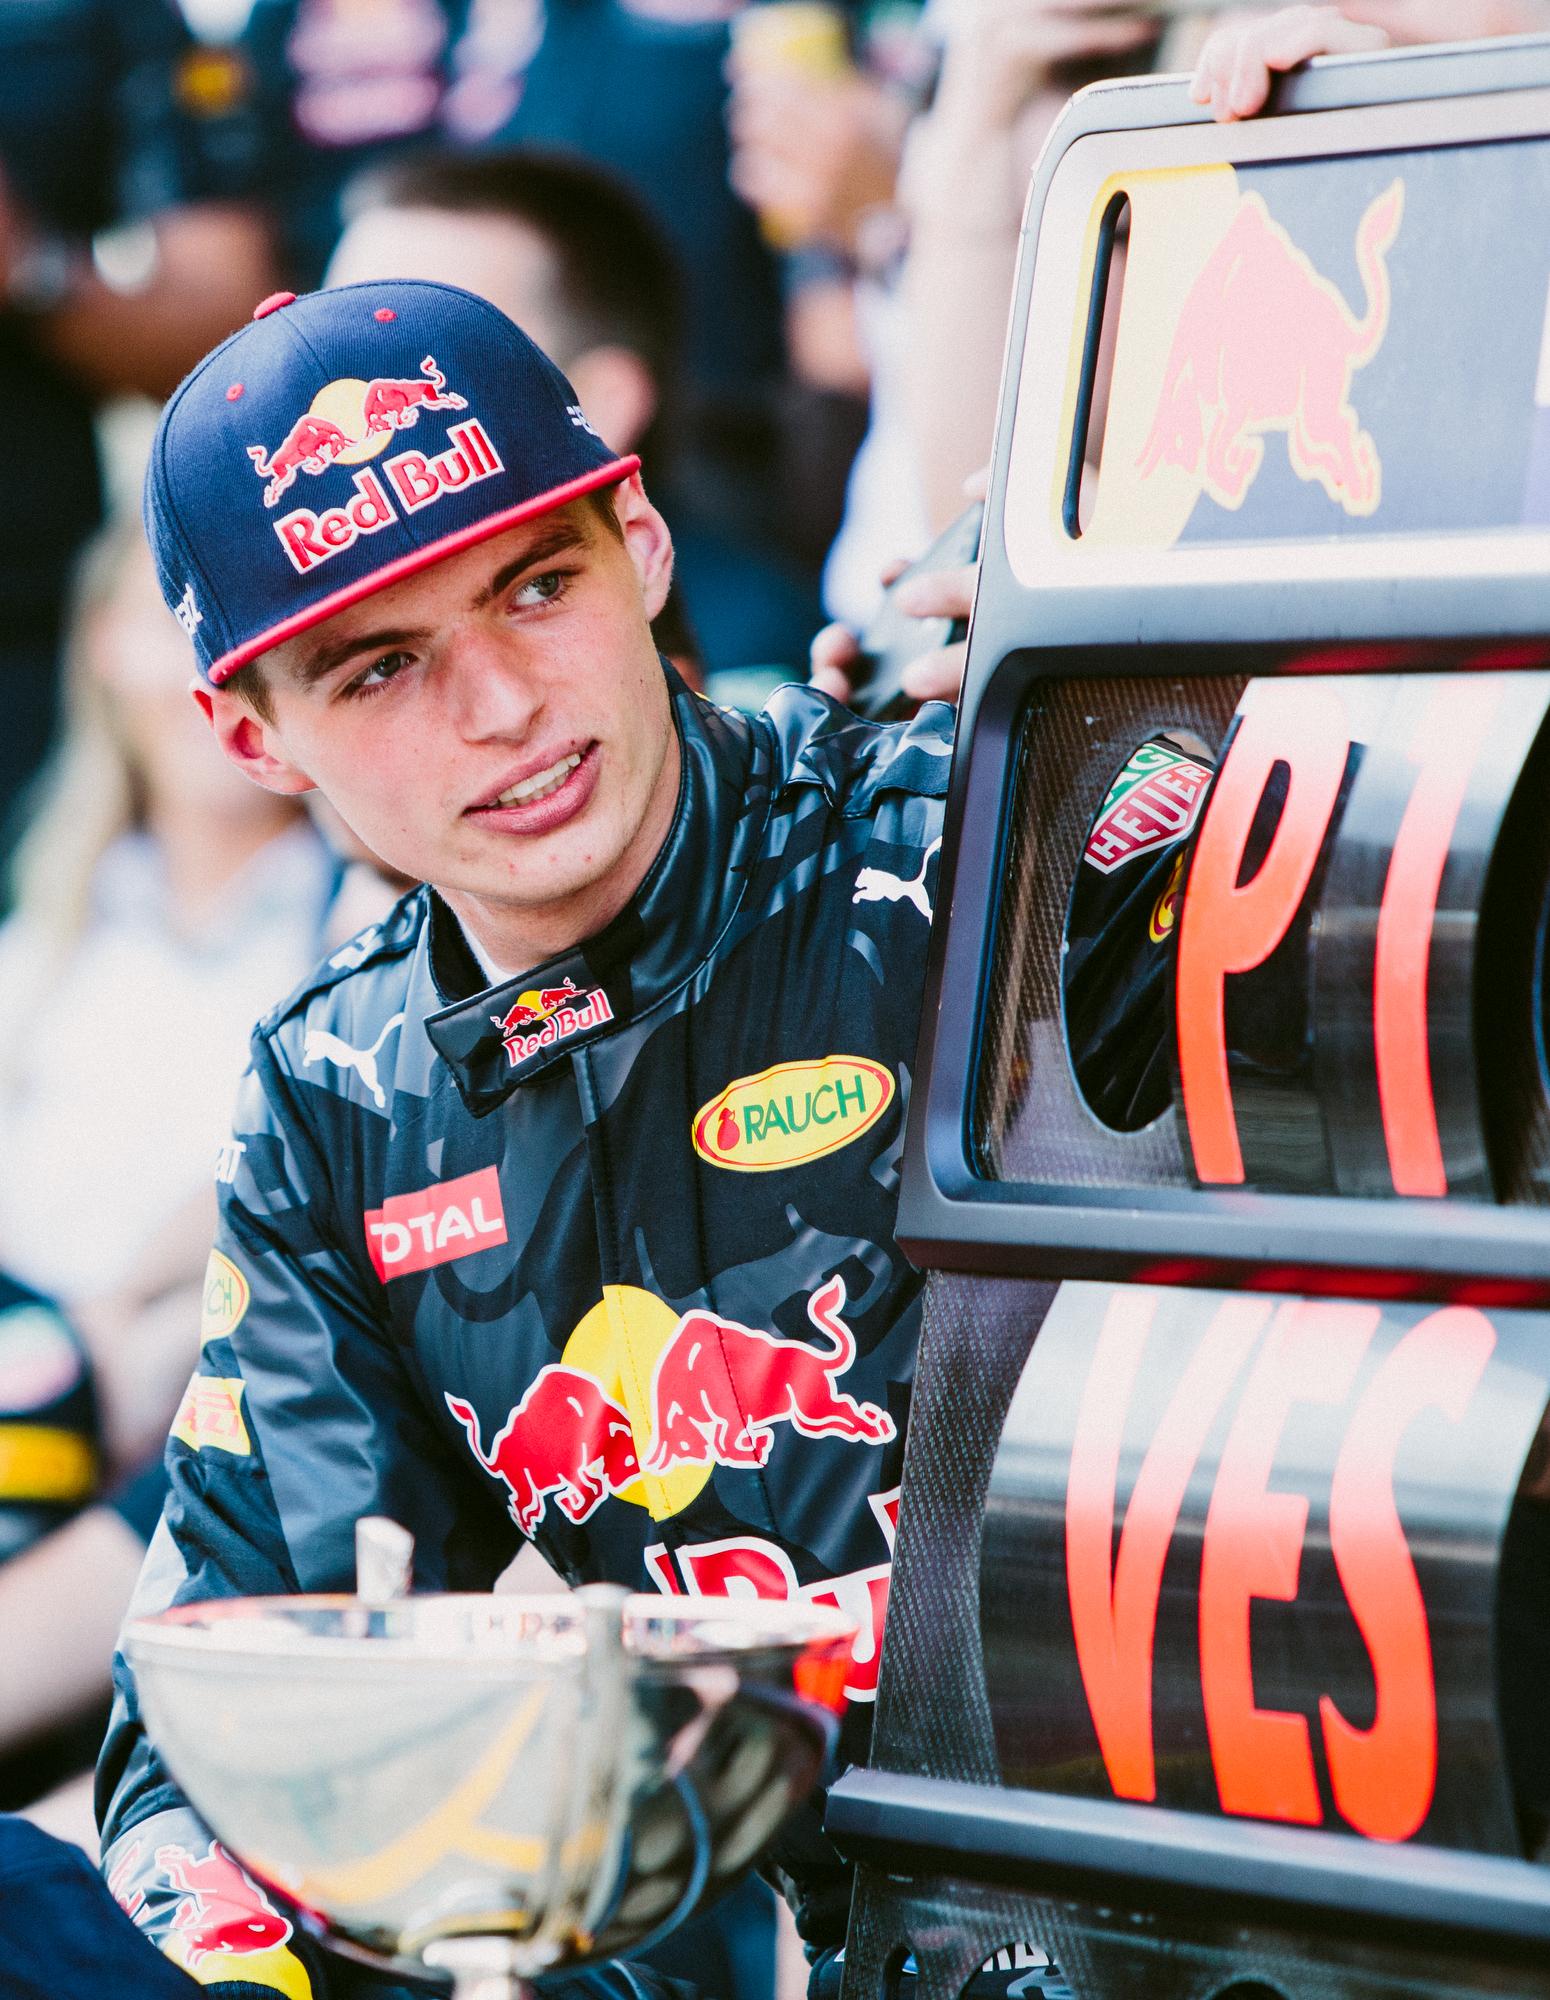 Max Verstappen, Red Bull. 2016 FIA Formula 1 Championship, Barcelona, Spain.